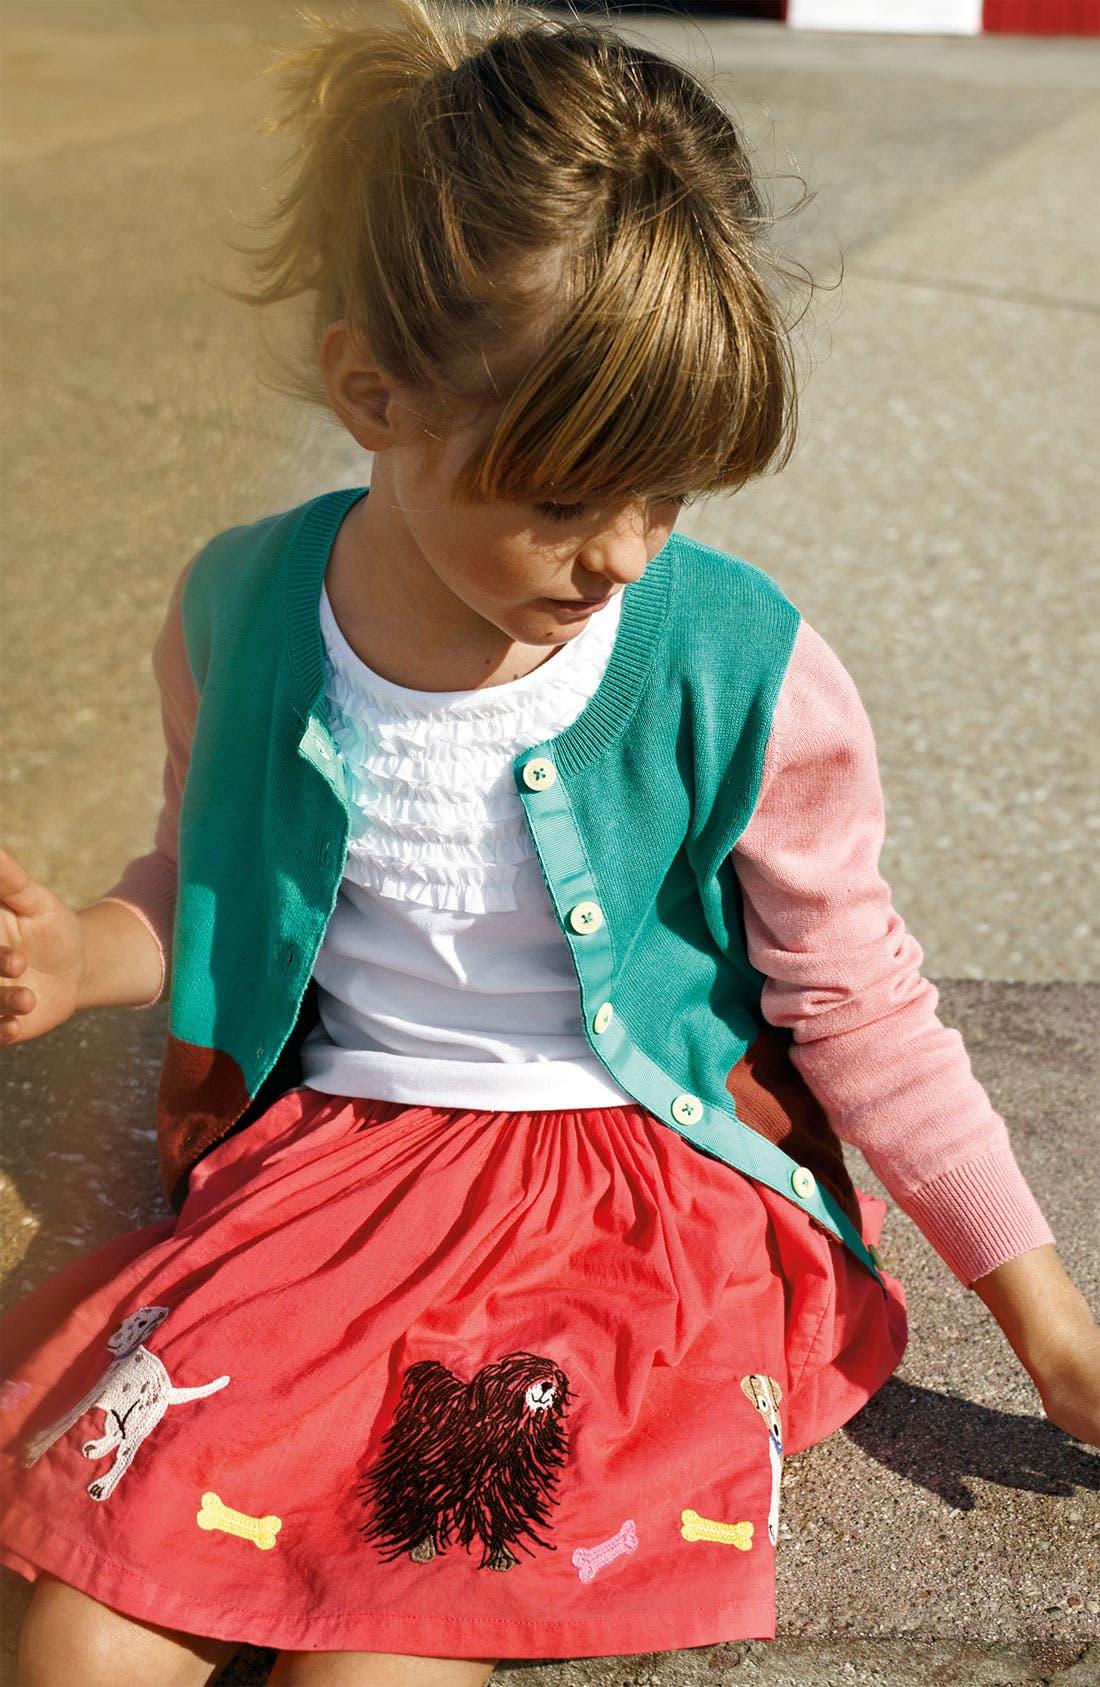 Alternate Image 1 Selected - Mini Boden Cardigan, Tank Top & Skirt (Little Girls & Big Girls)